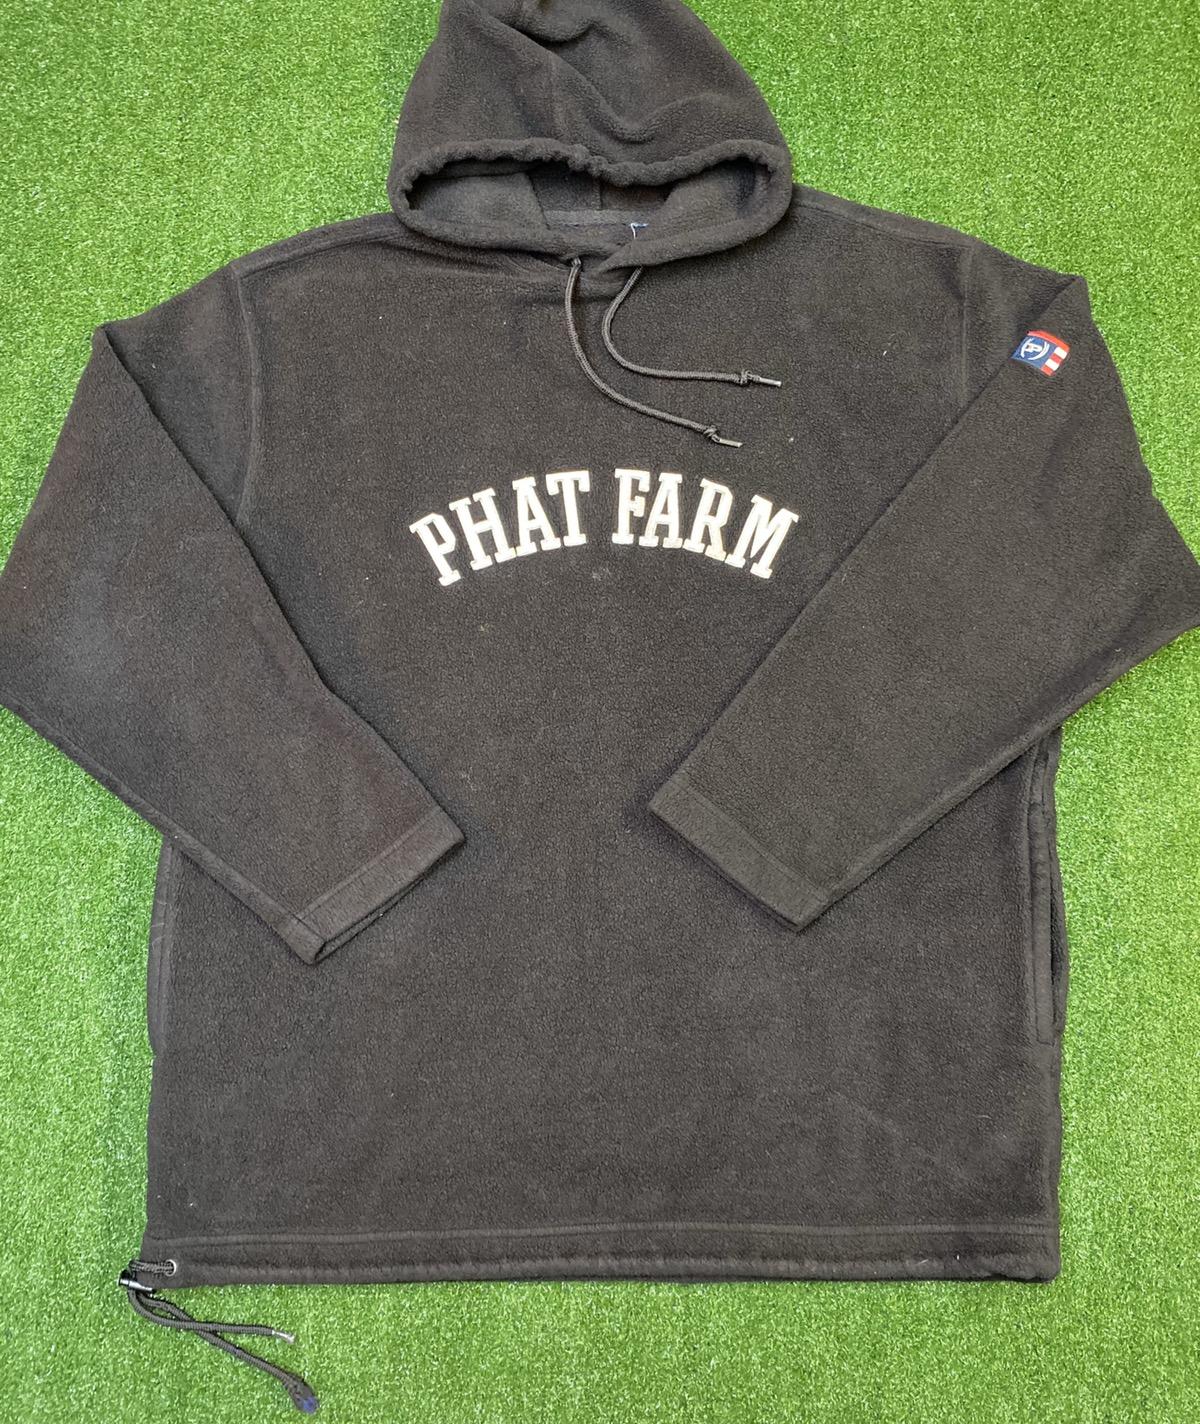 Vintage Phat Farm Fleece Hoodie Sweatshirt Sz Xxl 90s Vintage Grailed